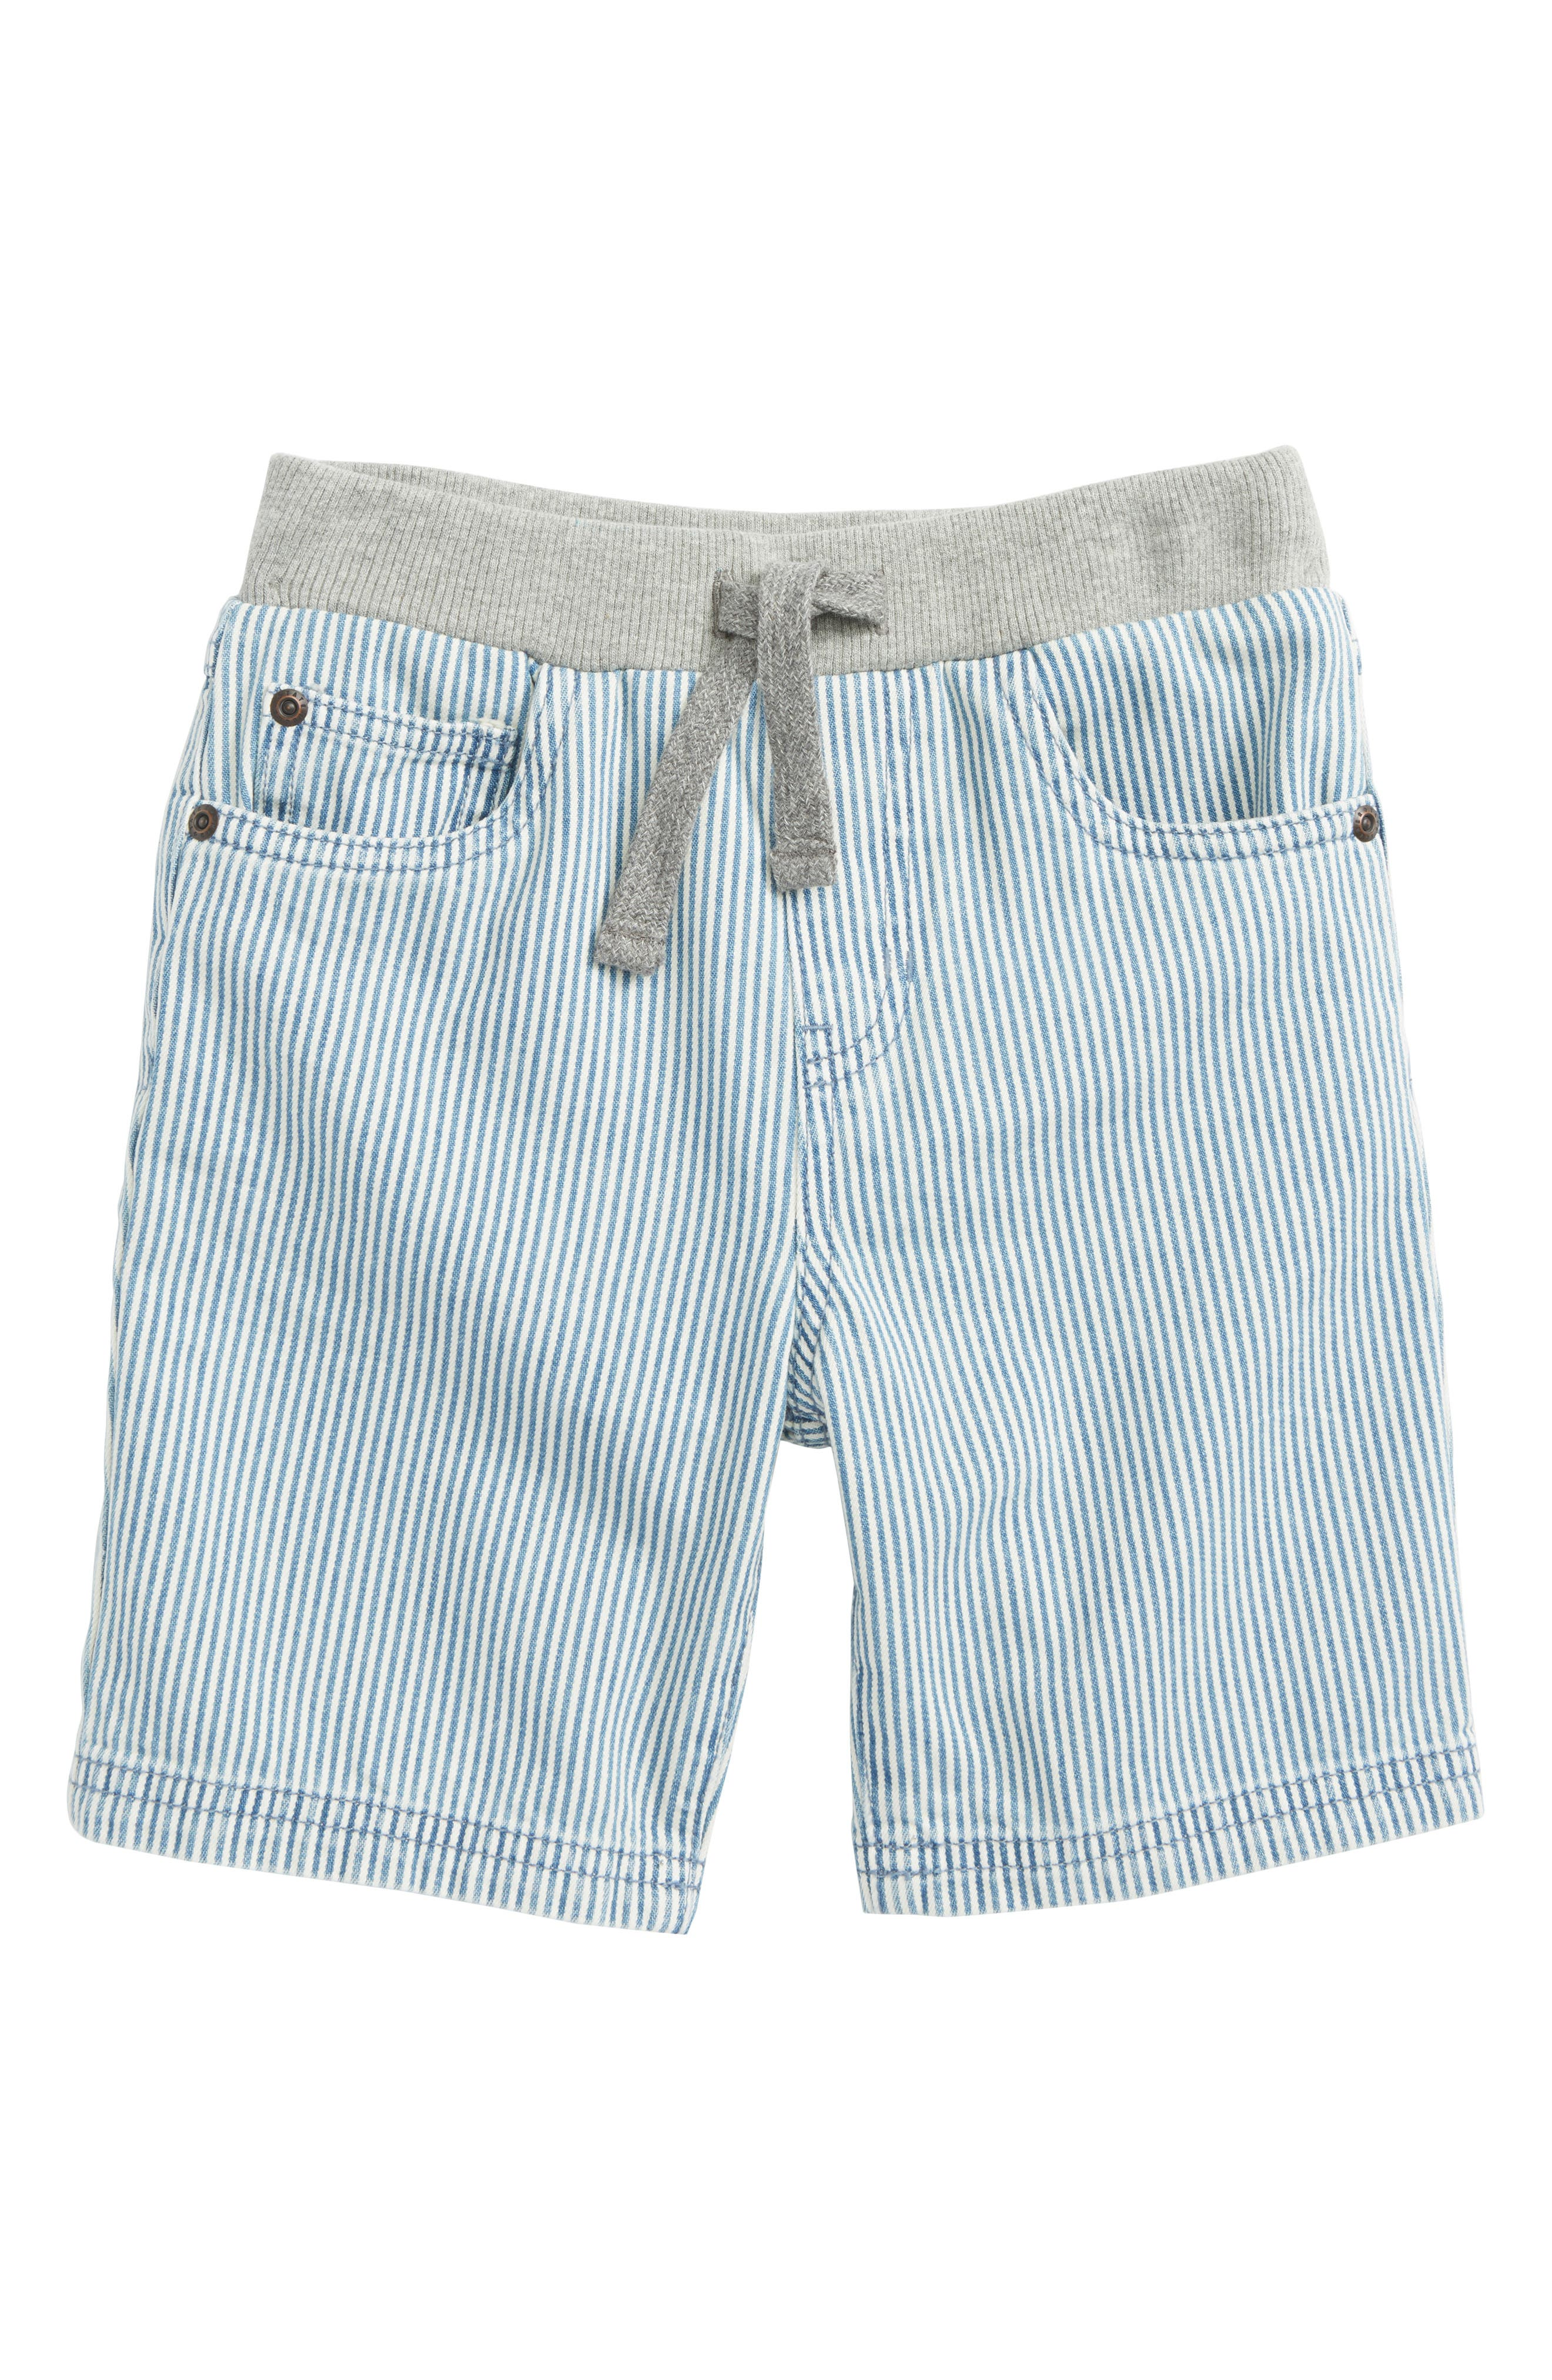 Stripe Shorts,                         Main,                         color,